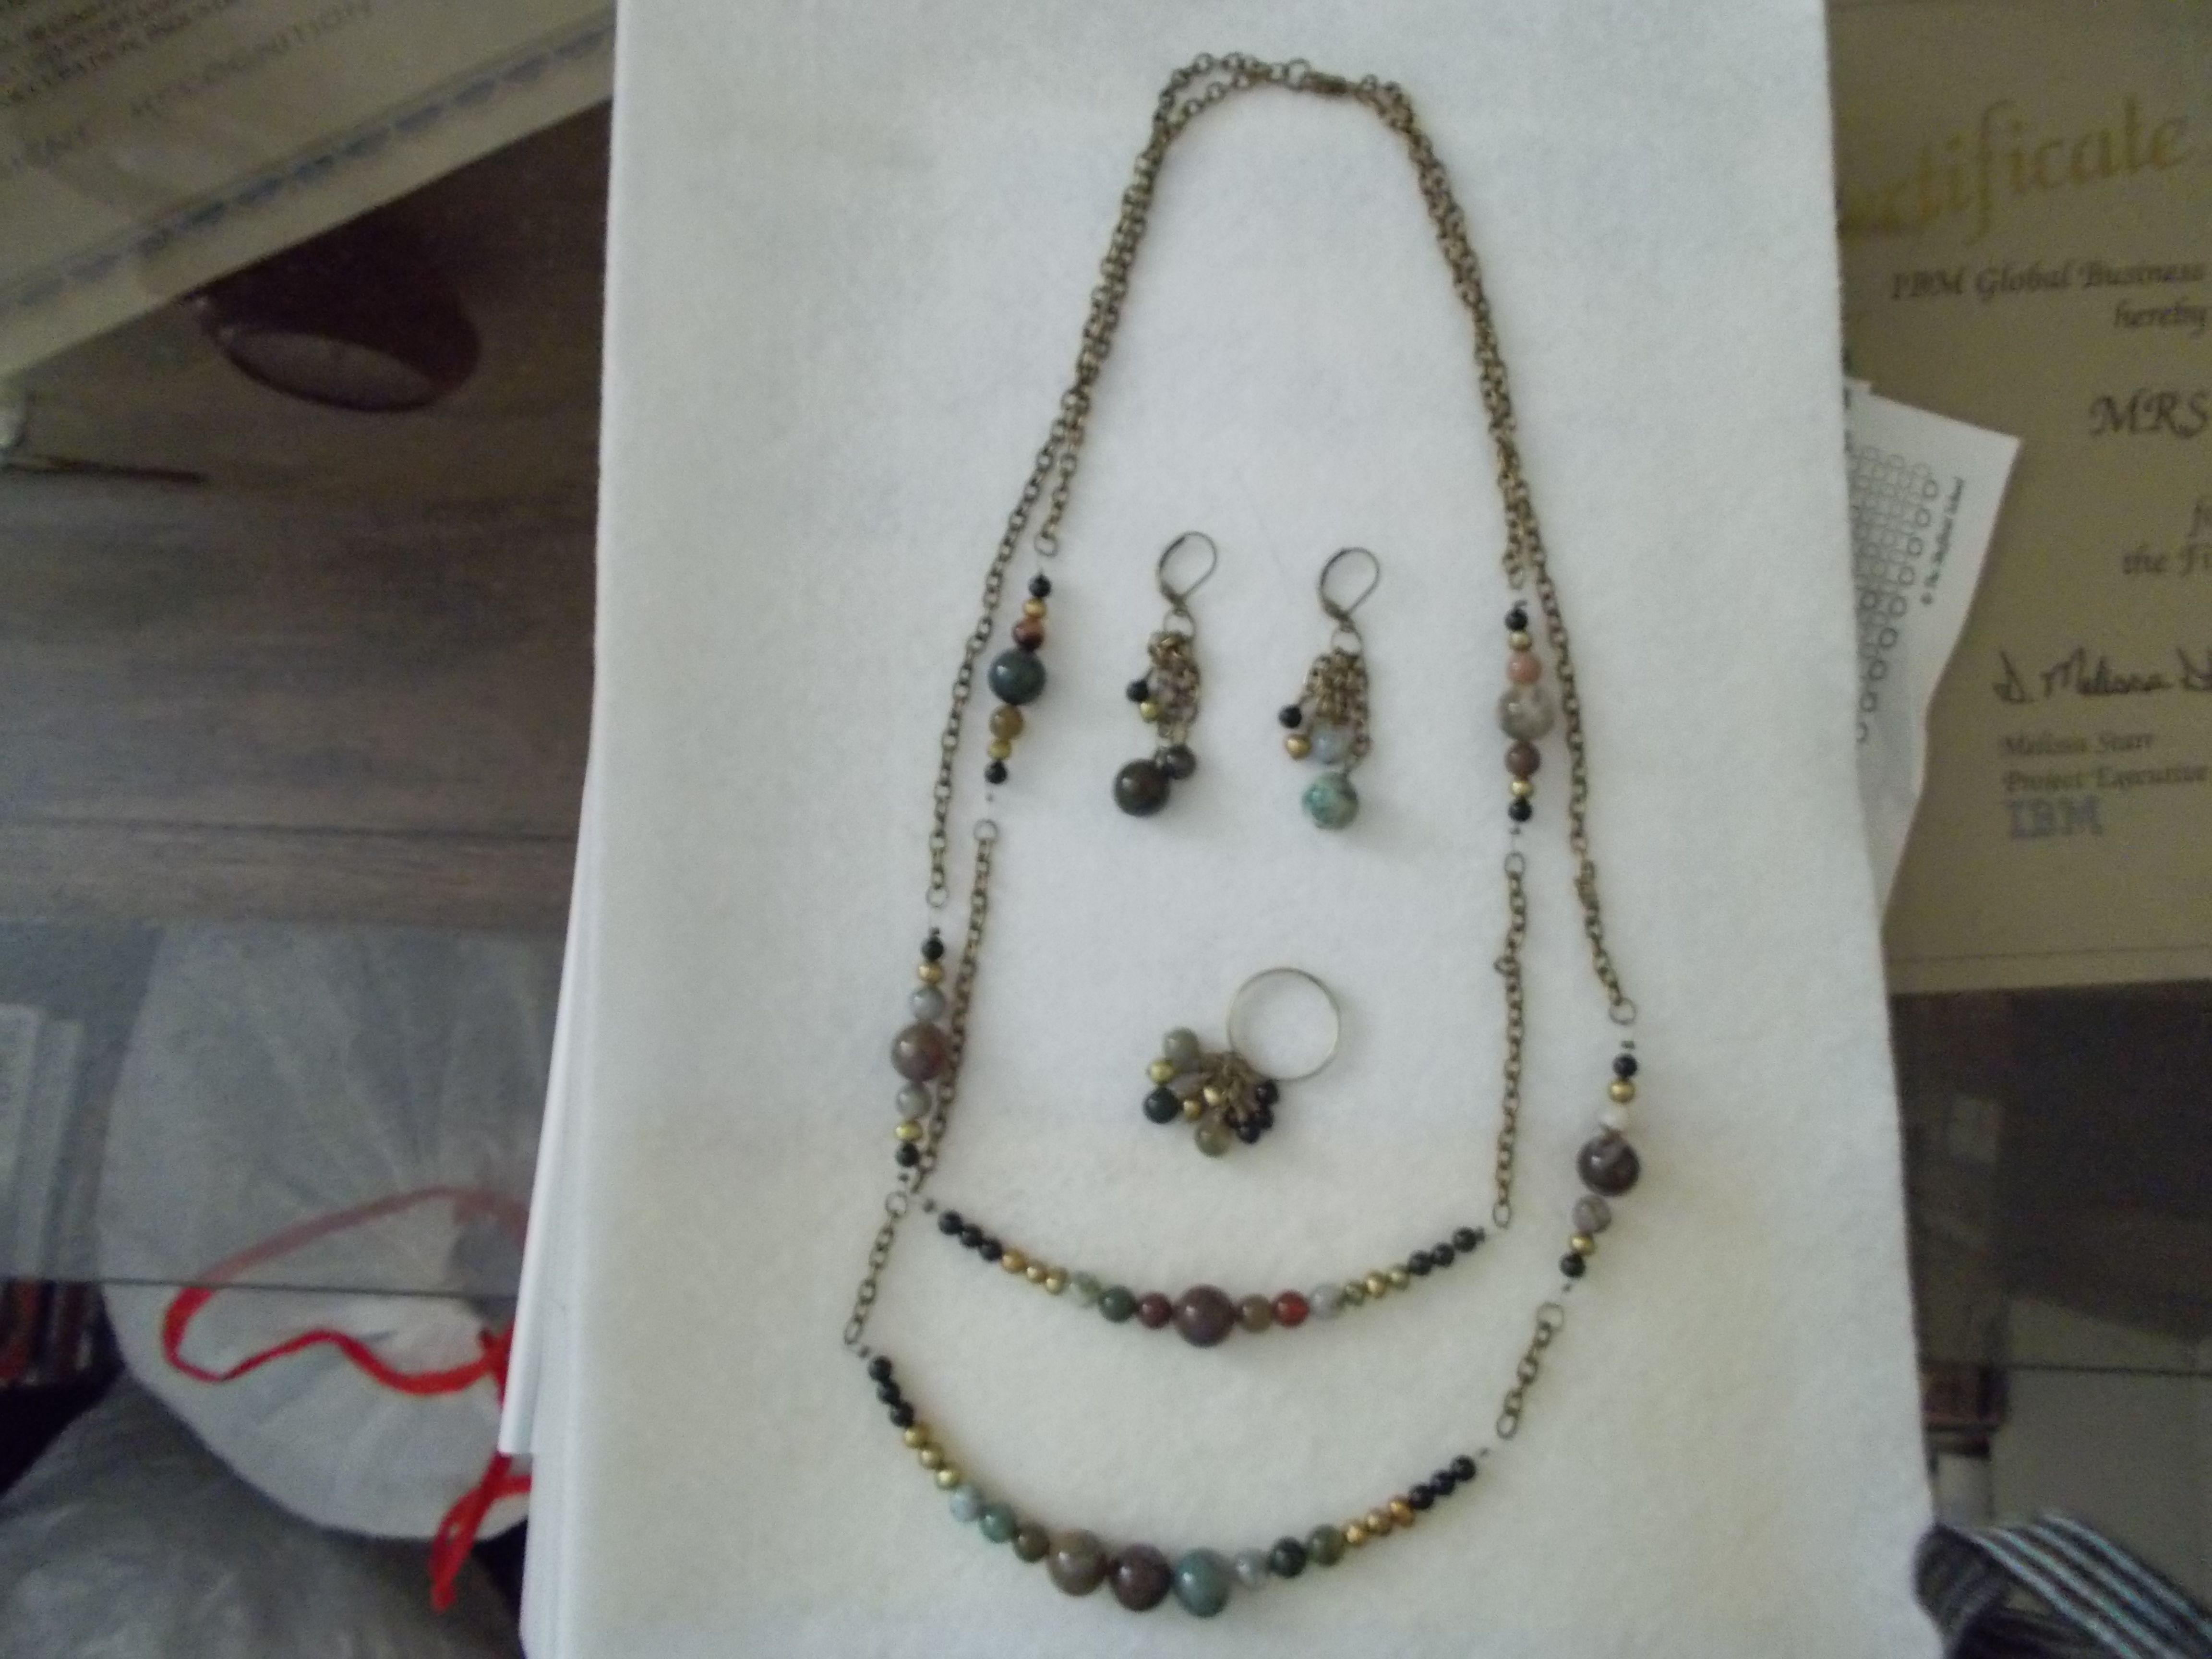 Sophisticated Stones Jewelry Set $94  AmysHandmadeJewelry.com